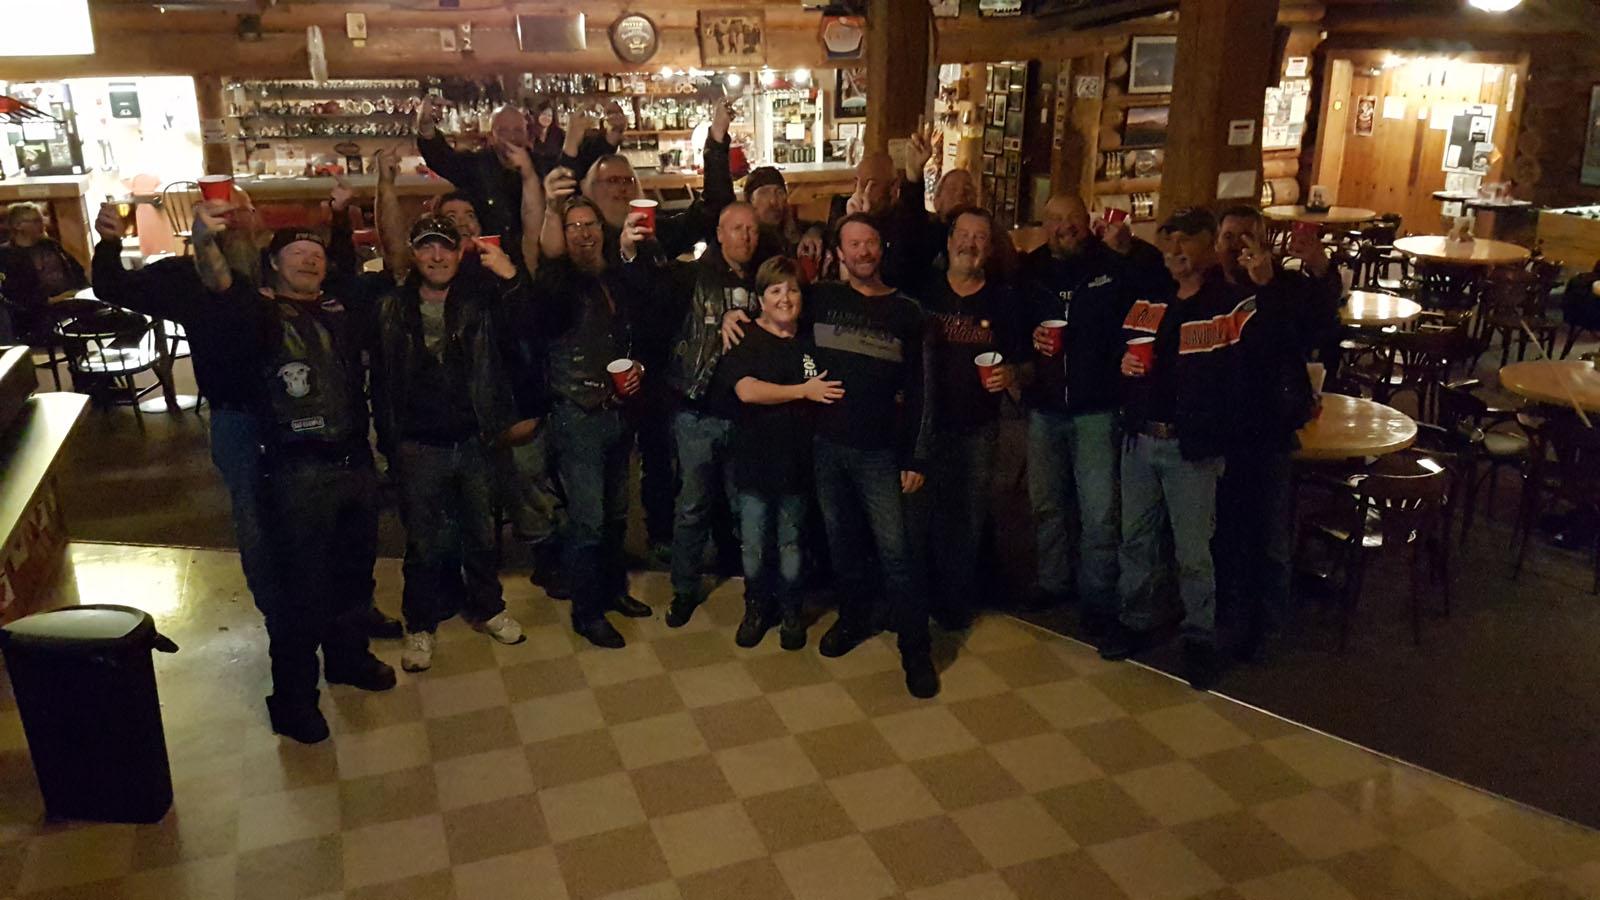 Log cabin pub 26